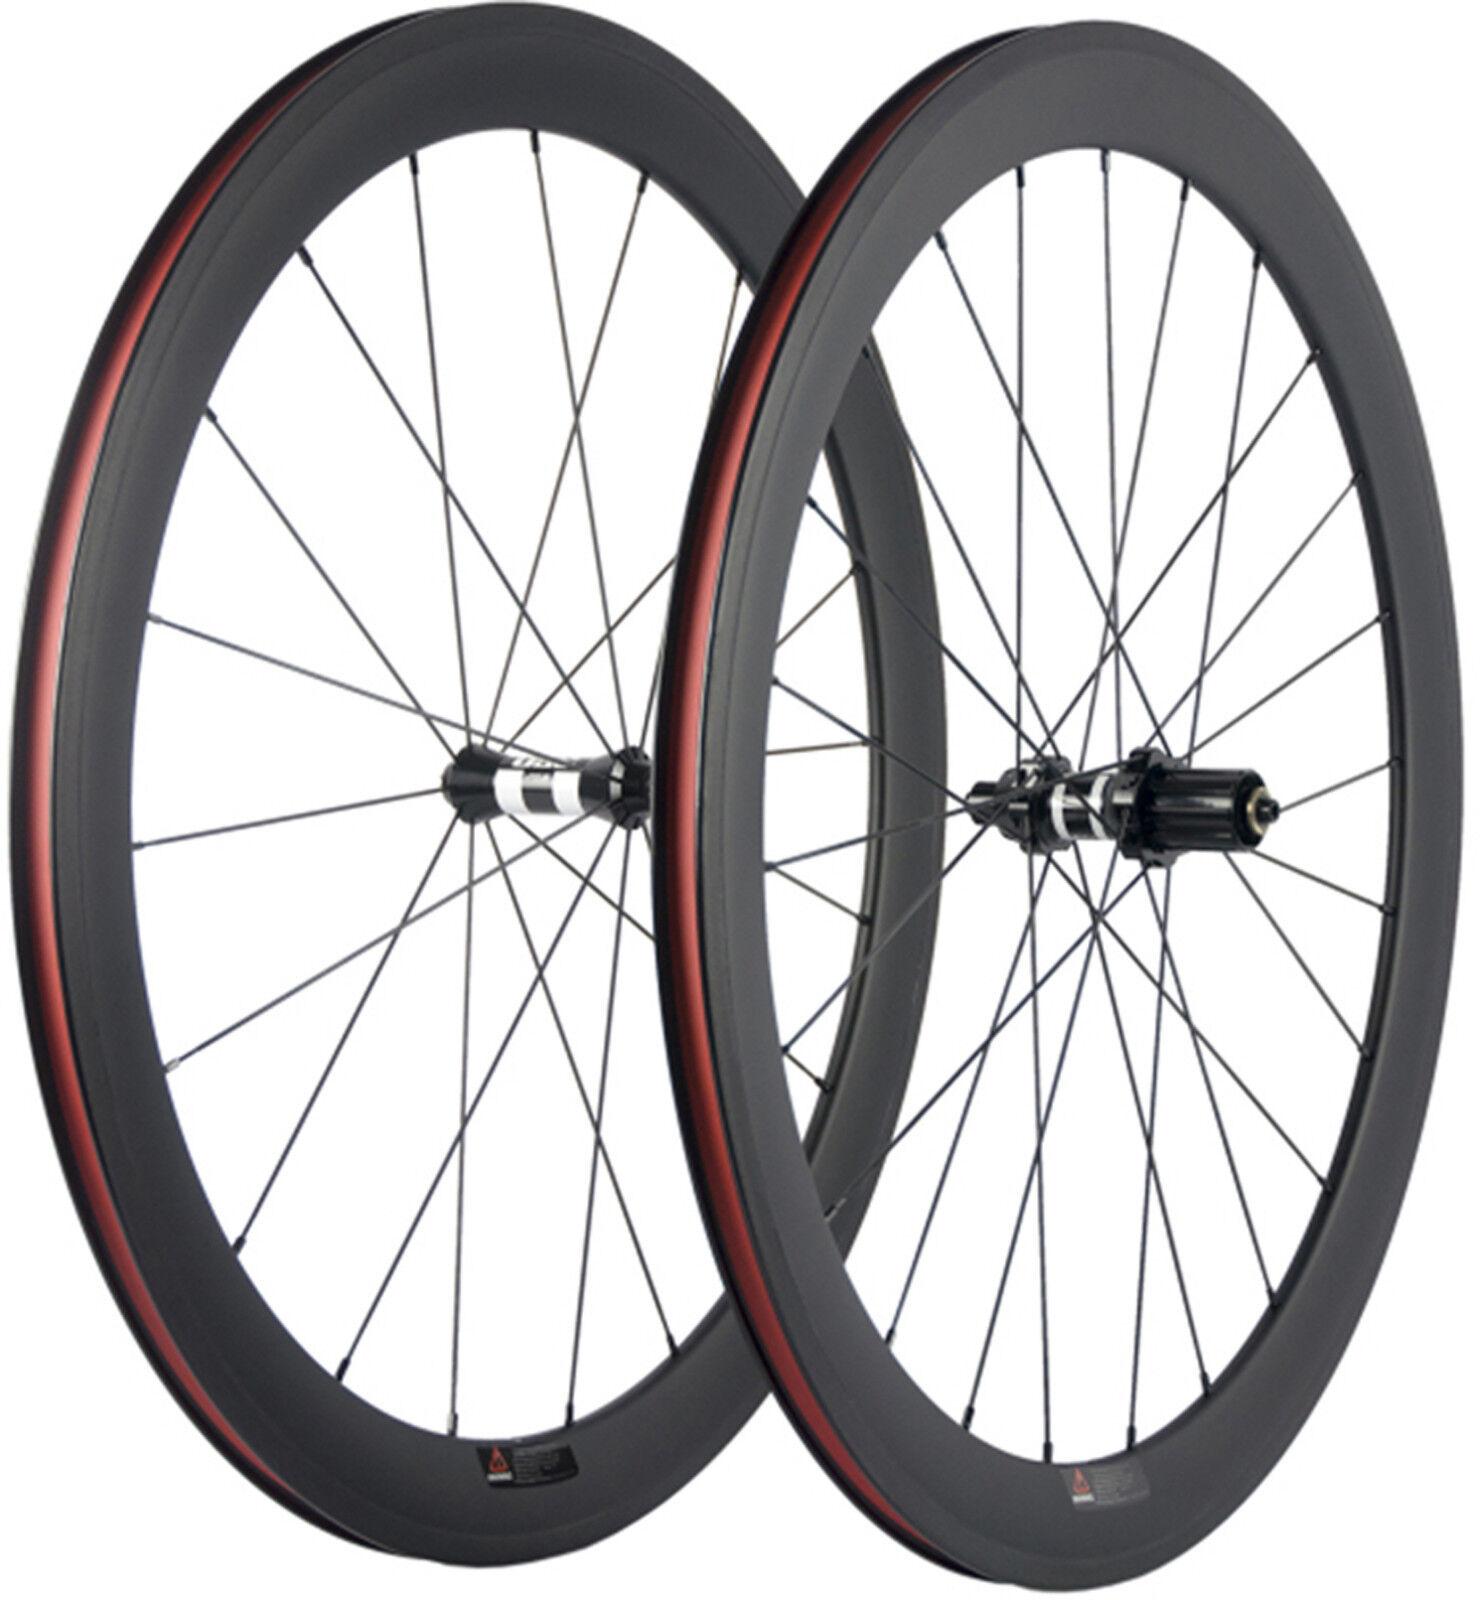 50mm Road Bike Wheels Clincher Biycle Wheelset Campagnolo Wheels 700C Race Wheel